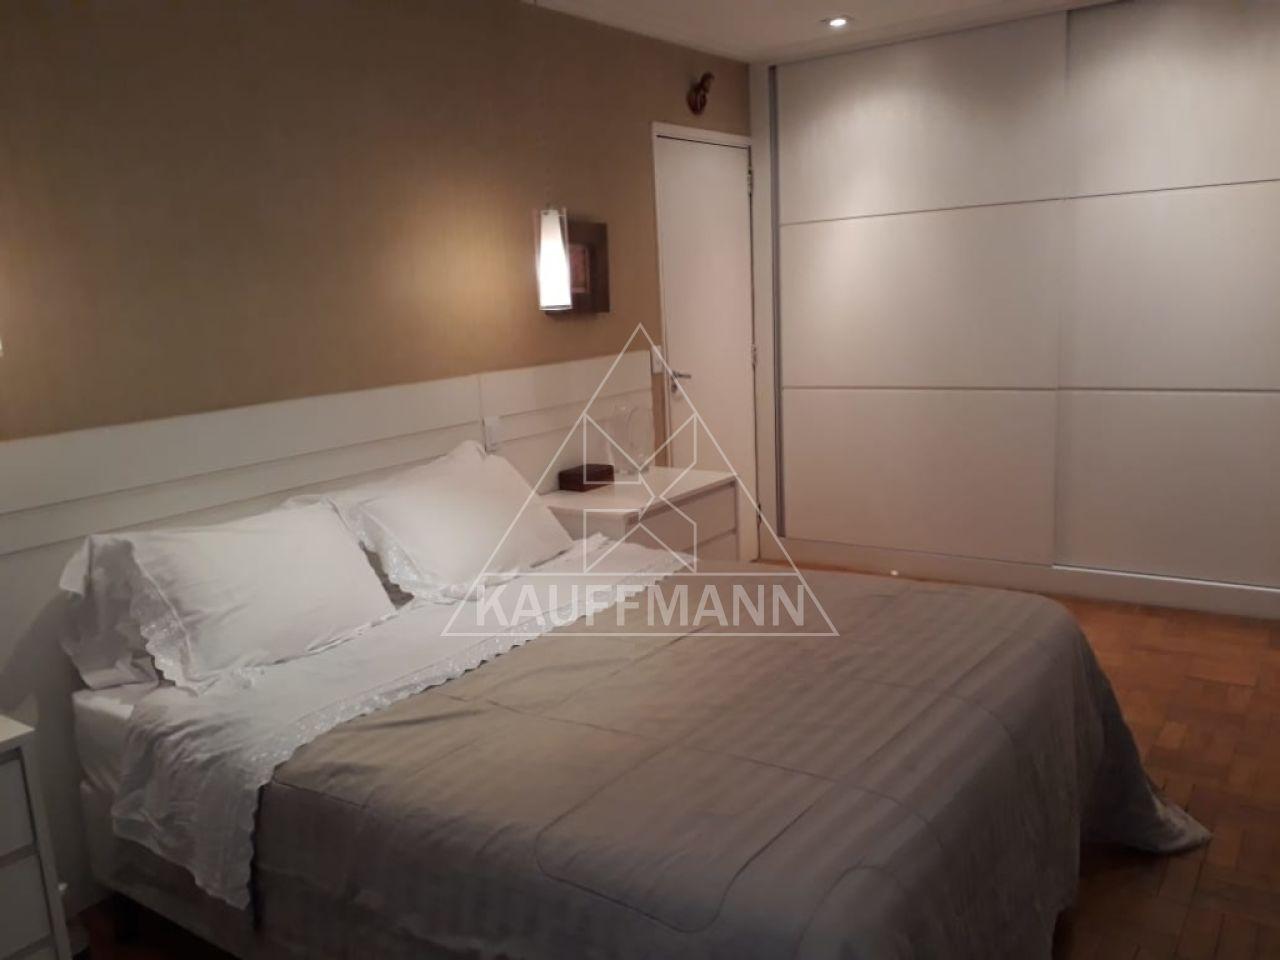 apartamento-venda-sao-paulo-jardim-paulista-3dormitorios-3suites-1vaga-174m2-Foto10